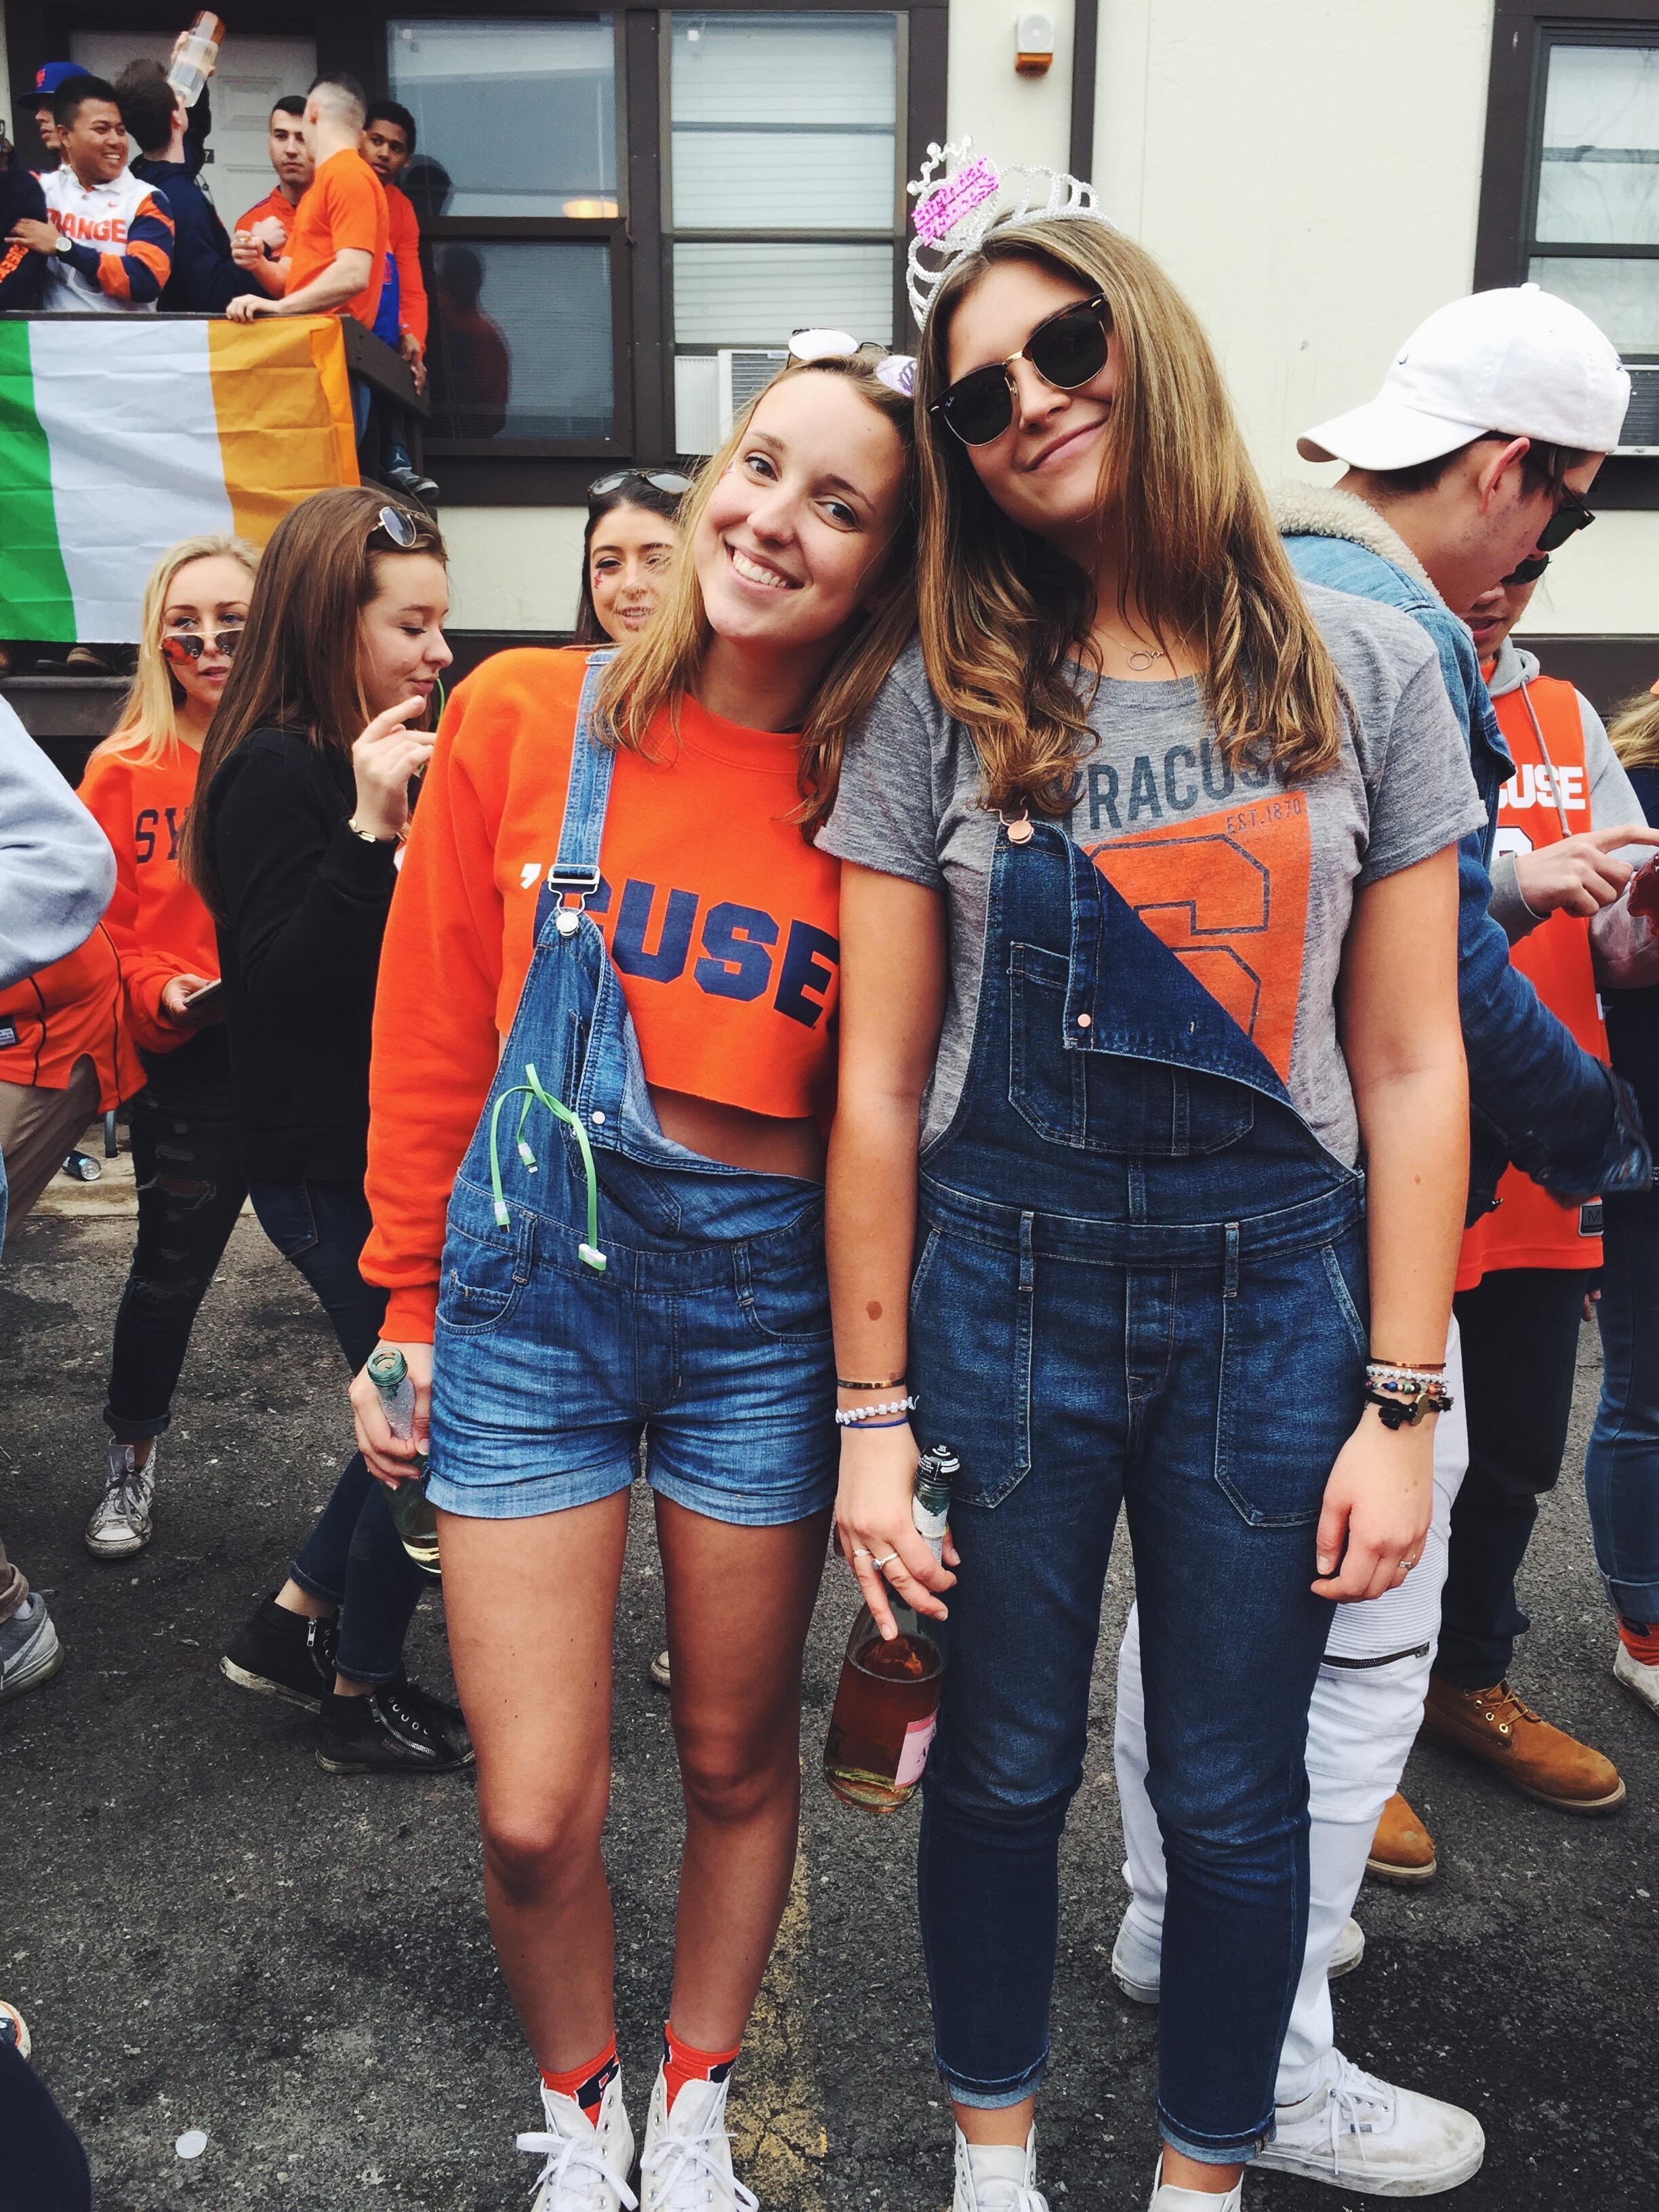 Freshmen Caroline Wenger and Courtney Anderson